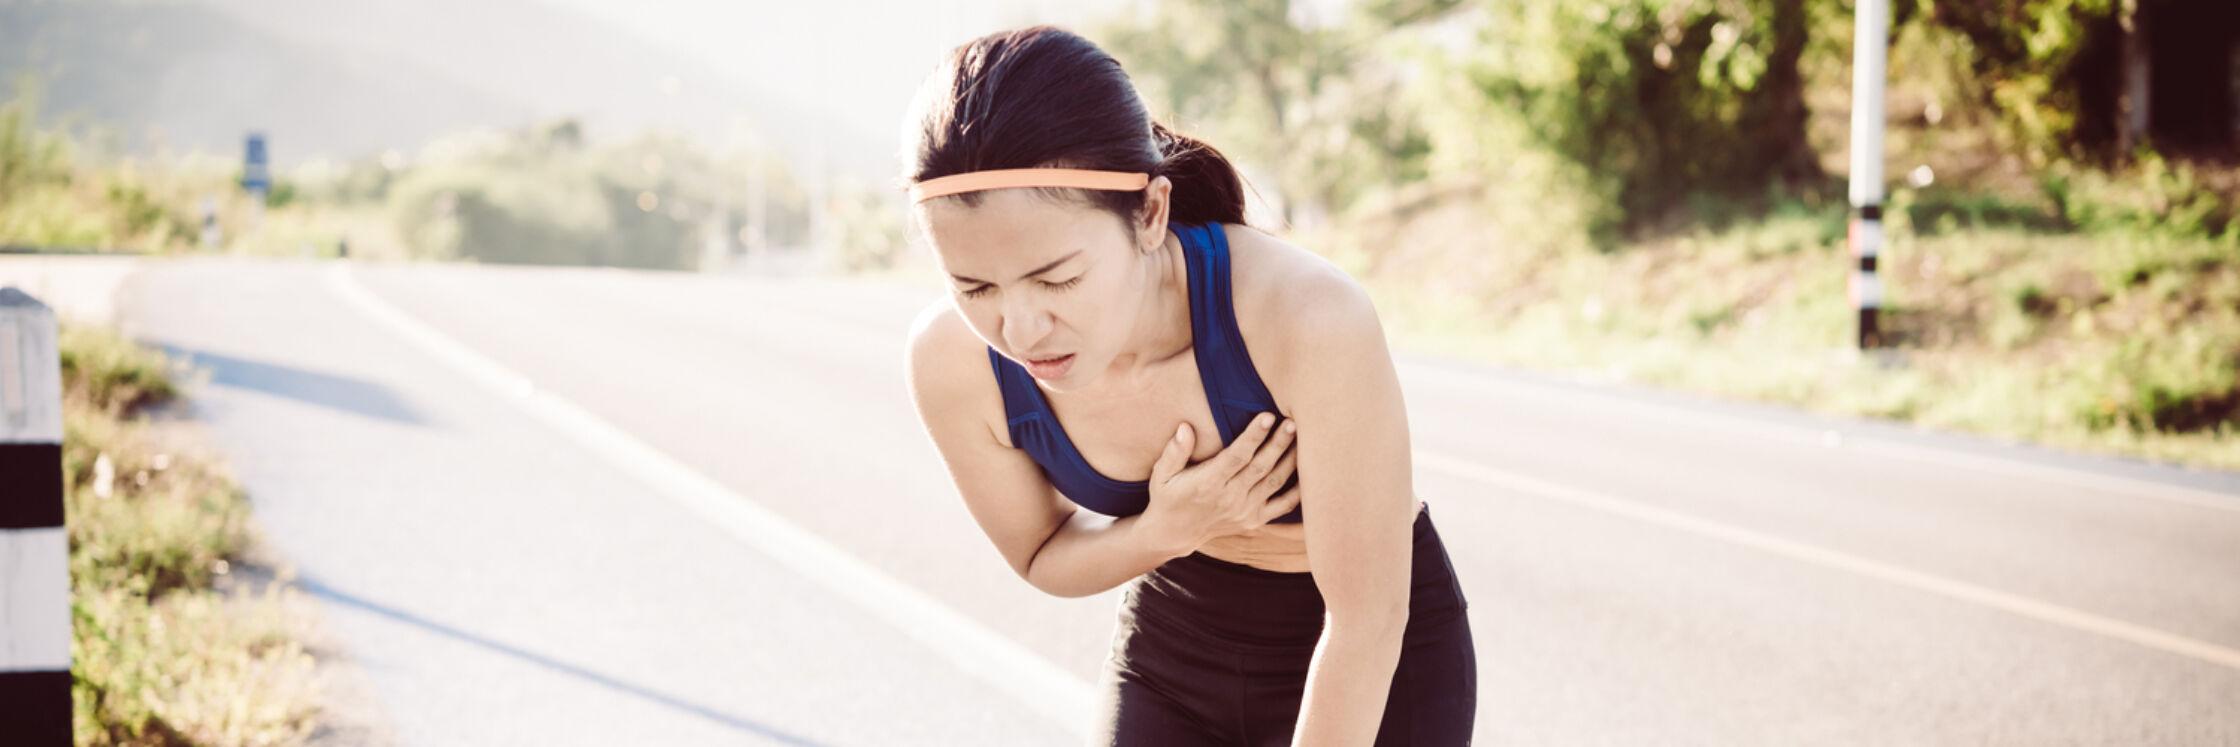 Plotse hartdood bij sporters